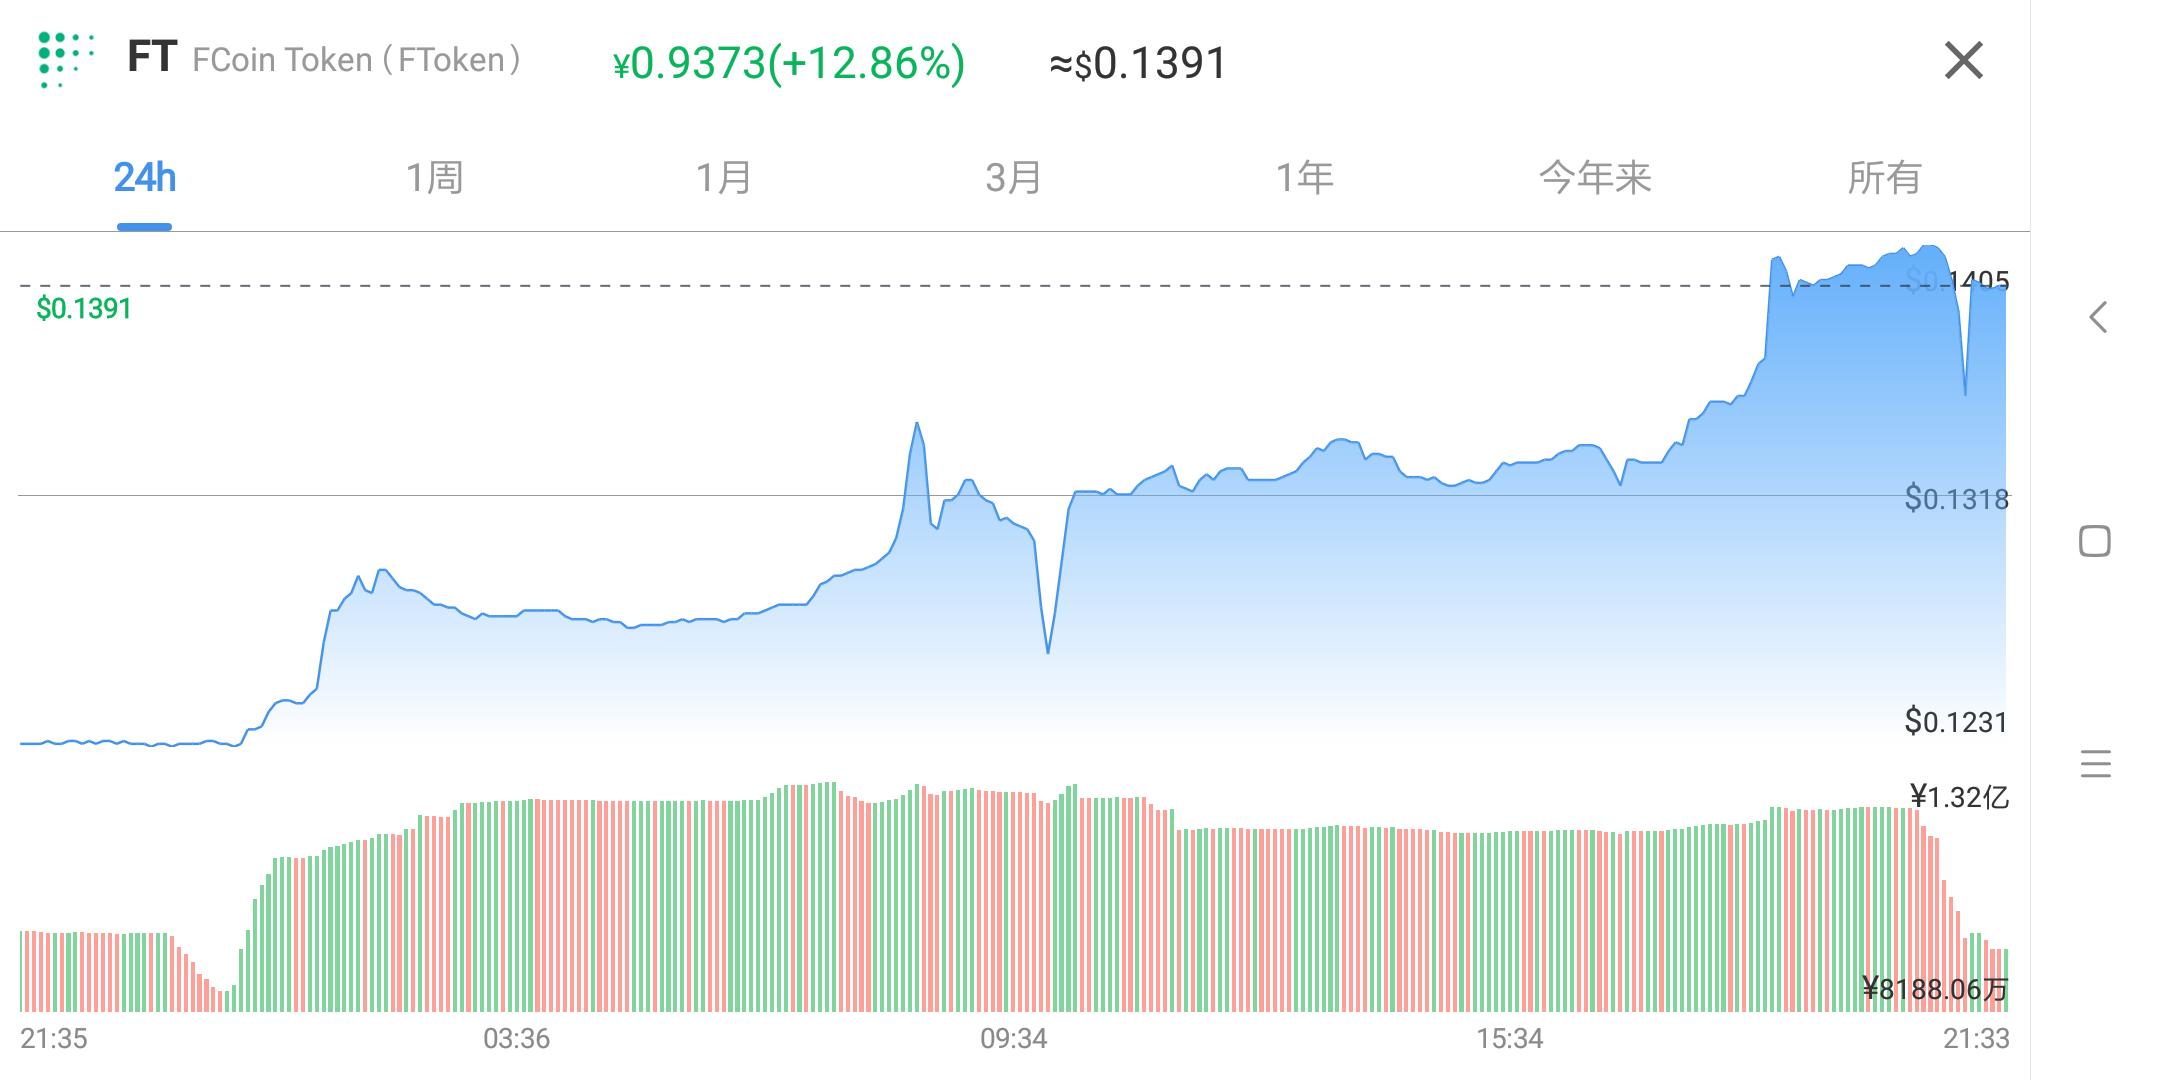 FT年内涨幅近10倍,投资人下场运营,Fractal公链究竟想干啥?